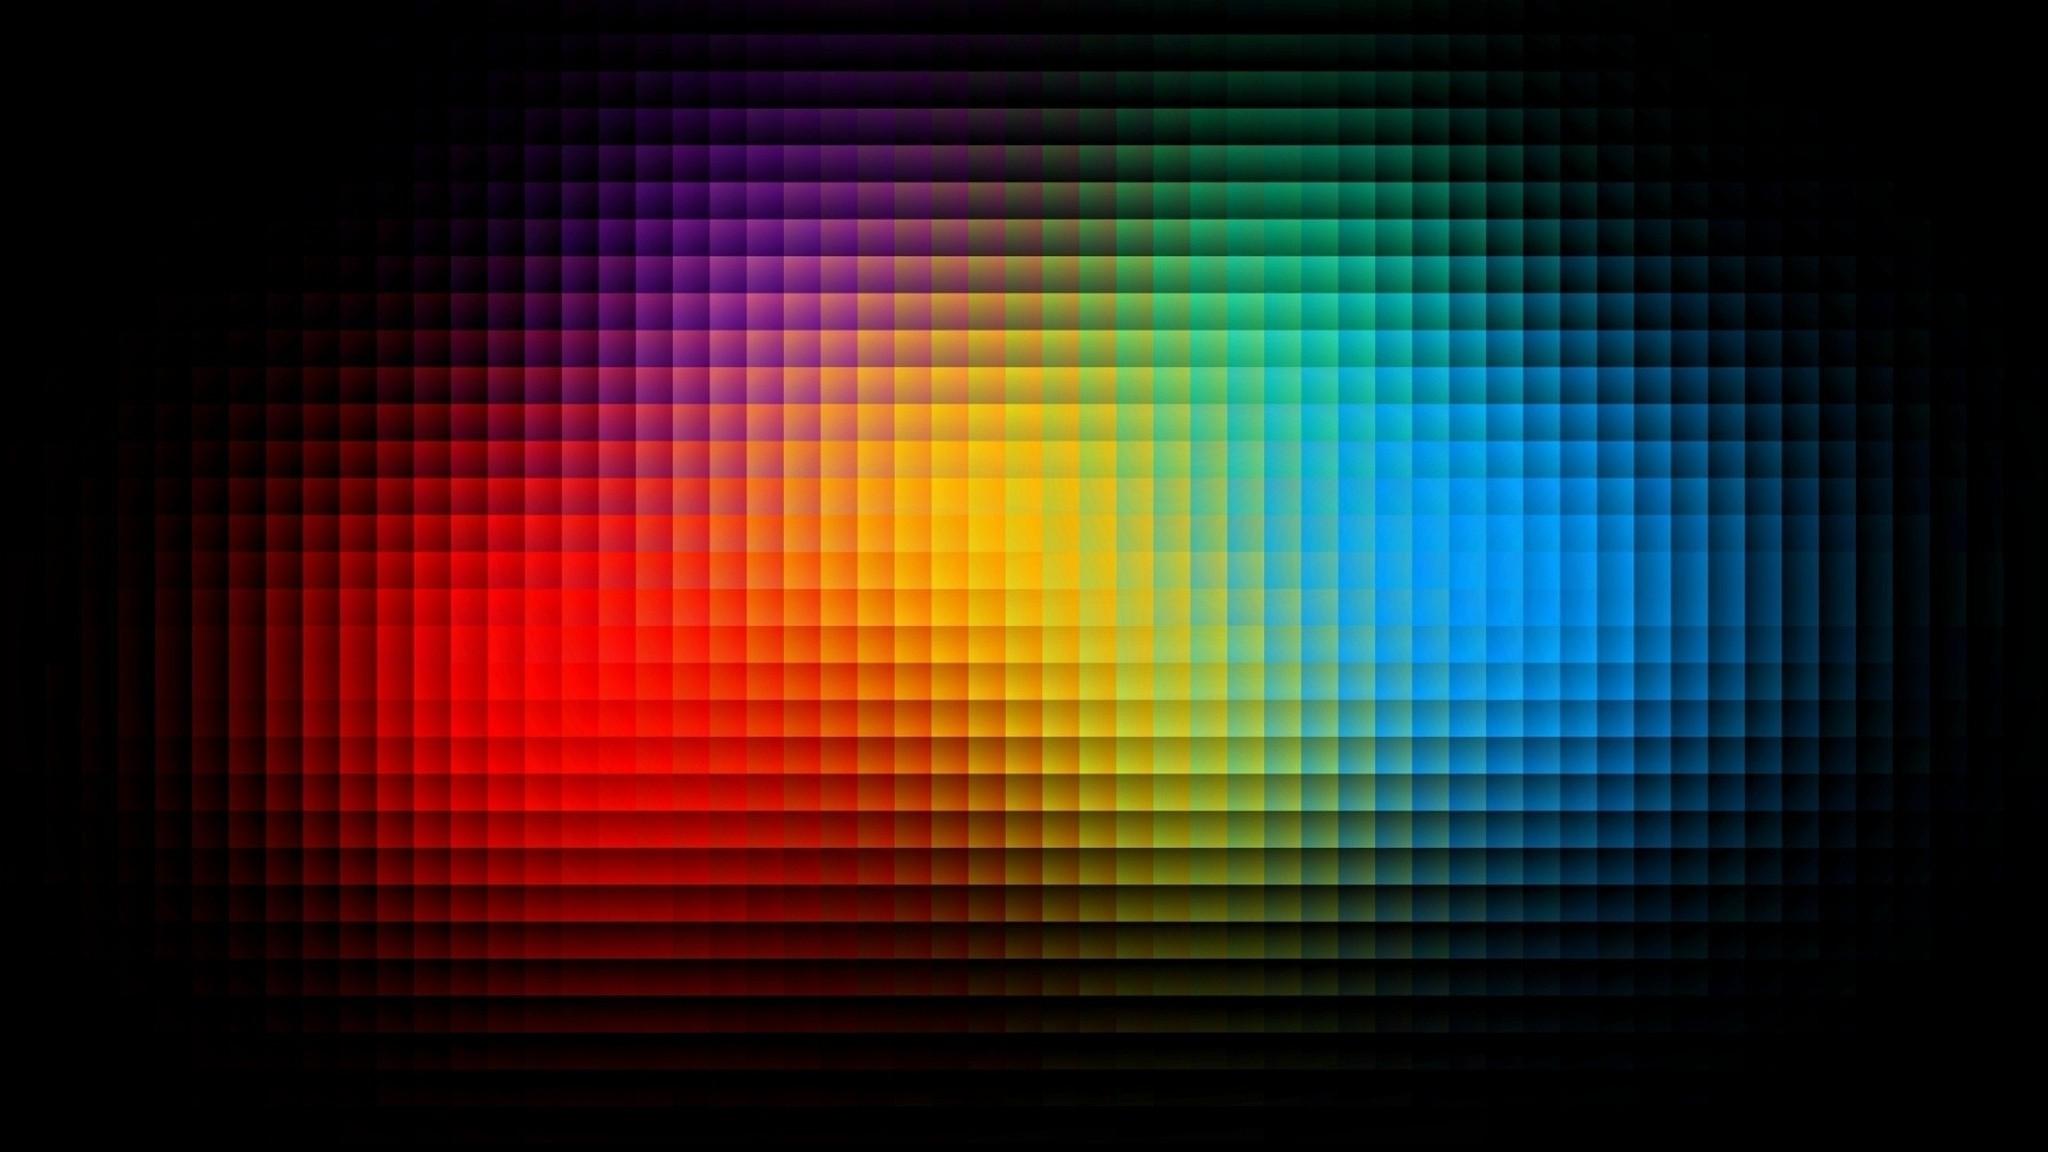 2048 x 1152 Pixels Wallpaper – WallpaperSafari (2048×1152) …